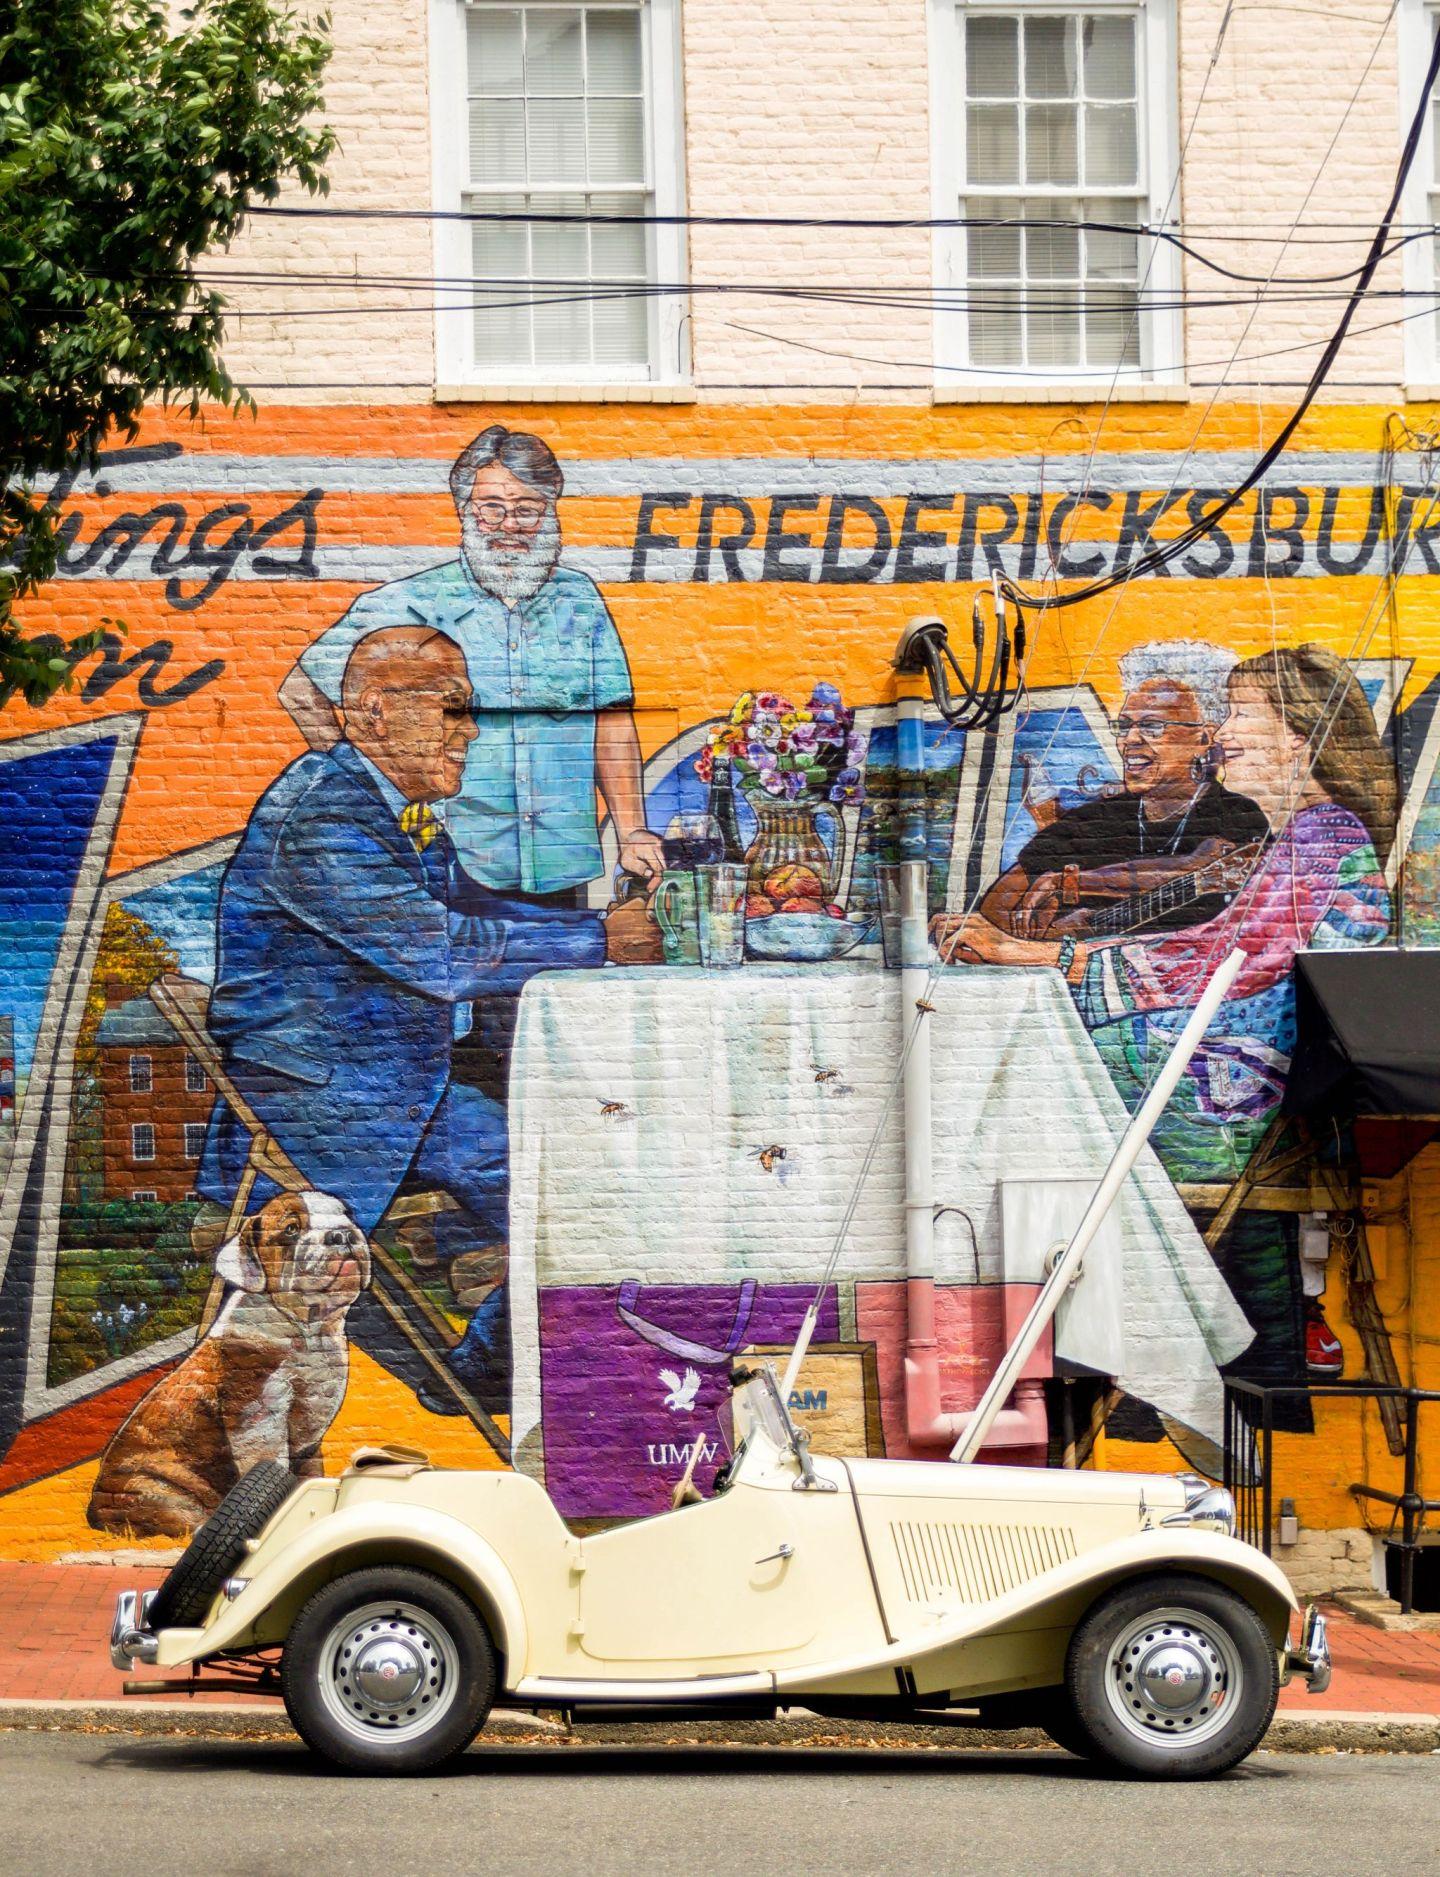 fredericksburg mural - visit fredericksburg - weekend in fredericksburg